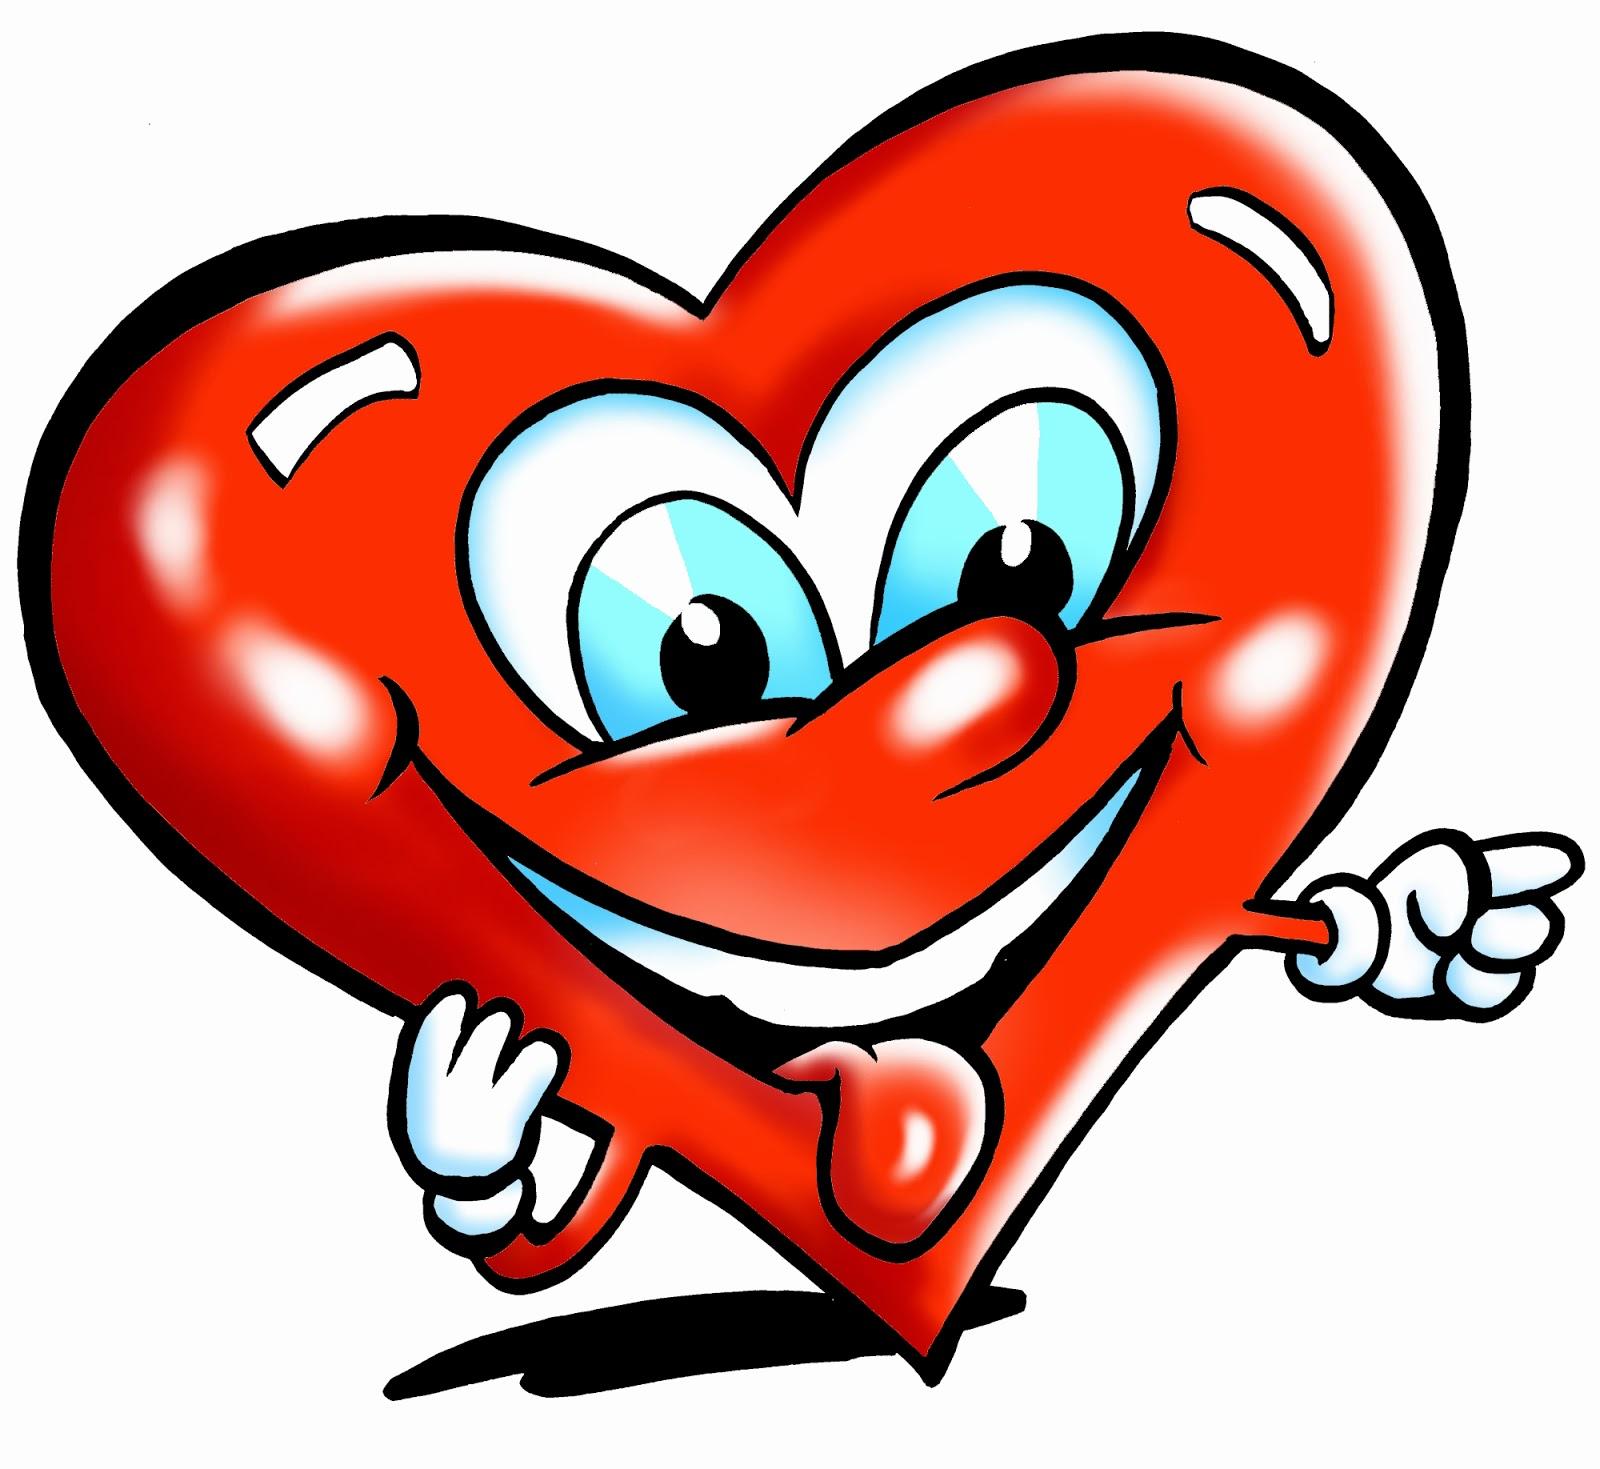 Joyful Expressions TearsLaughter Faint HeartHappy Heart